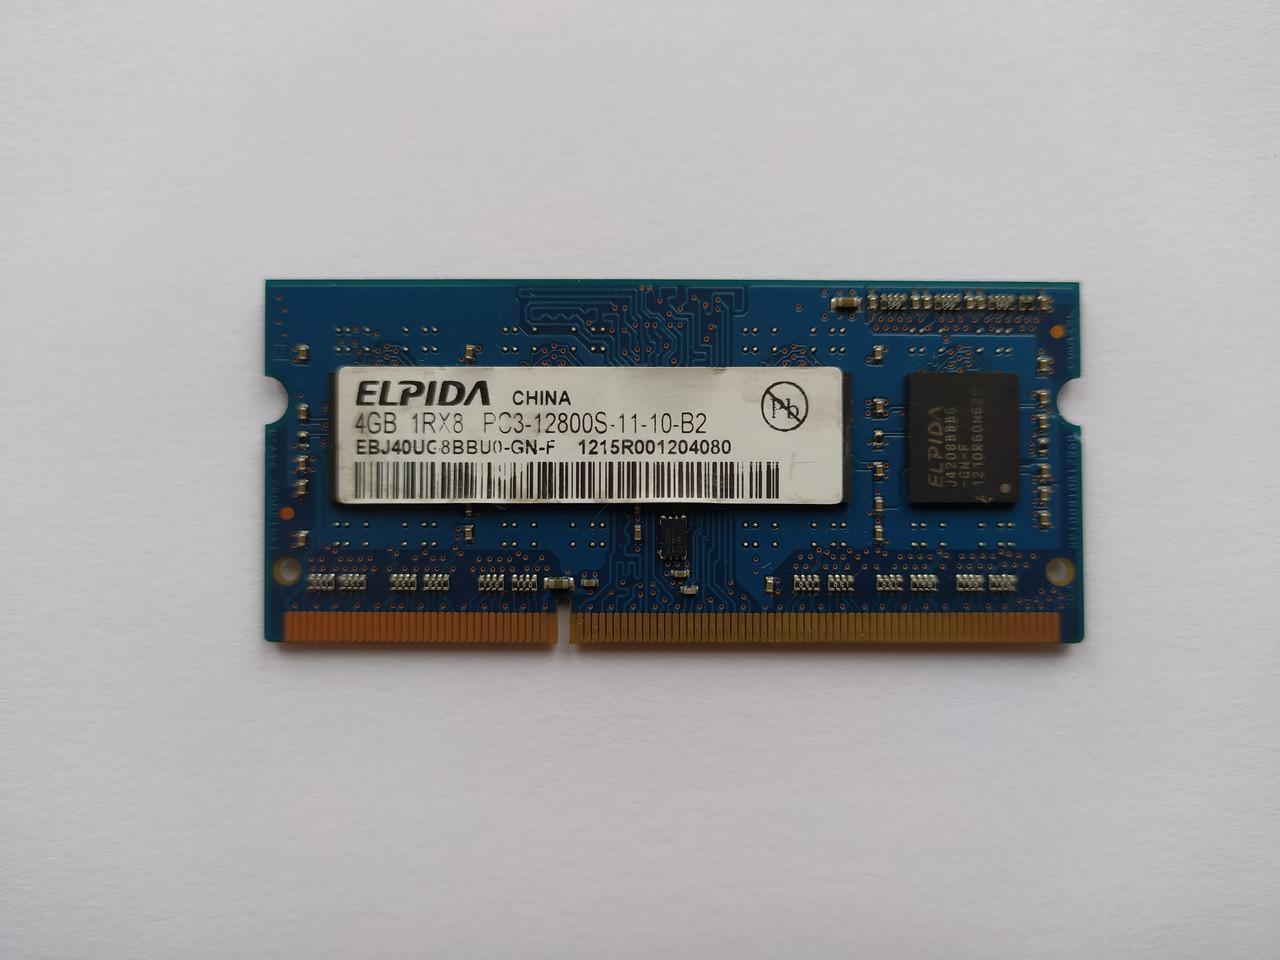 Оперативная память для ноутбука SODIMM Elpida DDR3 4Gb 1600MHz PC3-12800S (EBJ40UG8BBU0-GN-F) Б/У